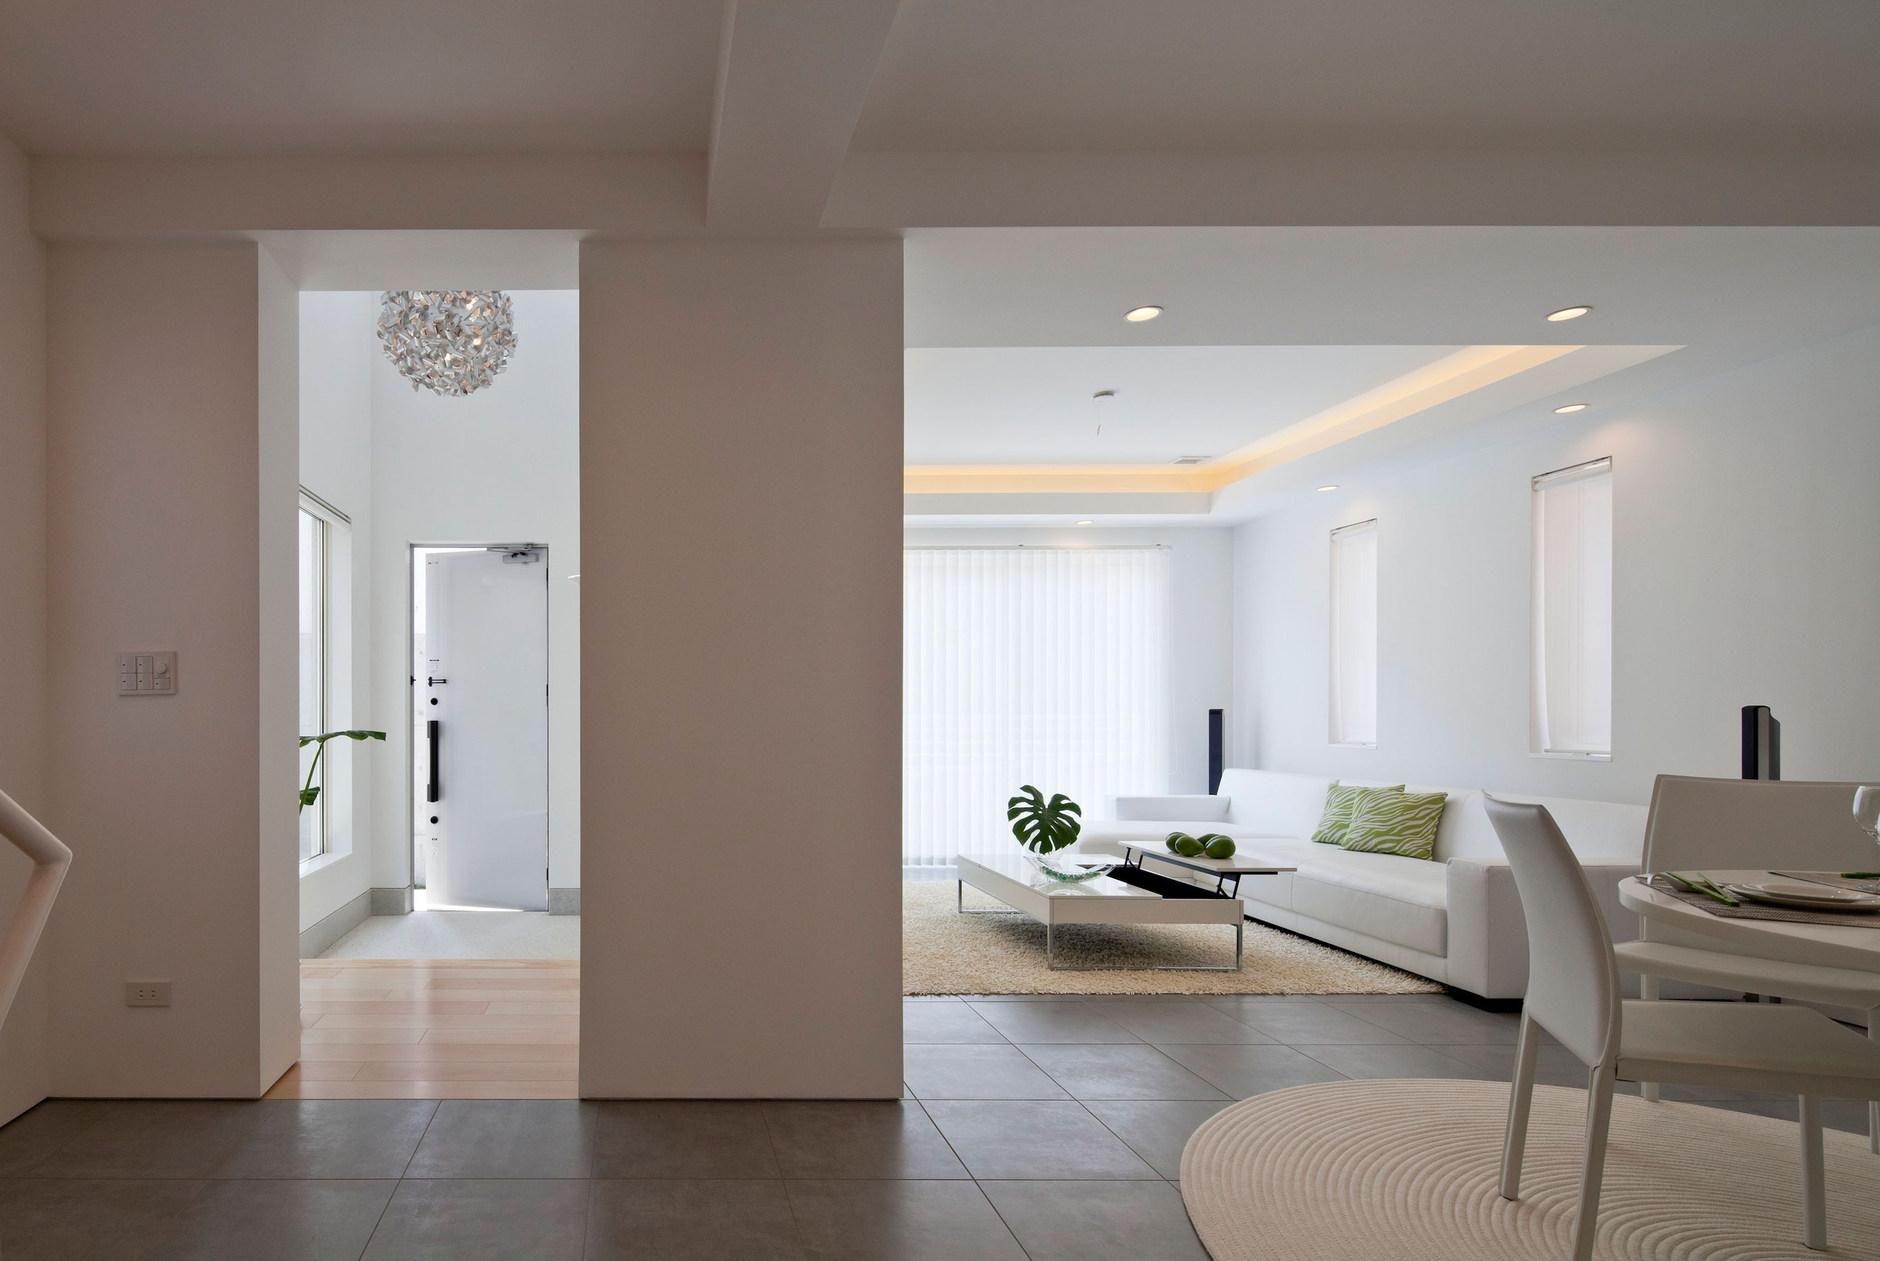 Modern zen house by rck design karmatrendz for Modern house zen design